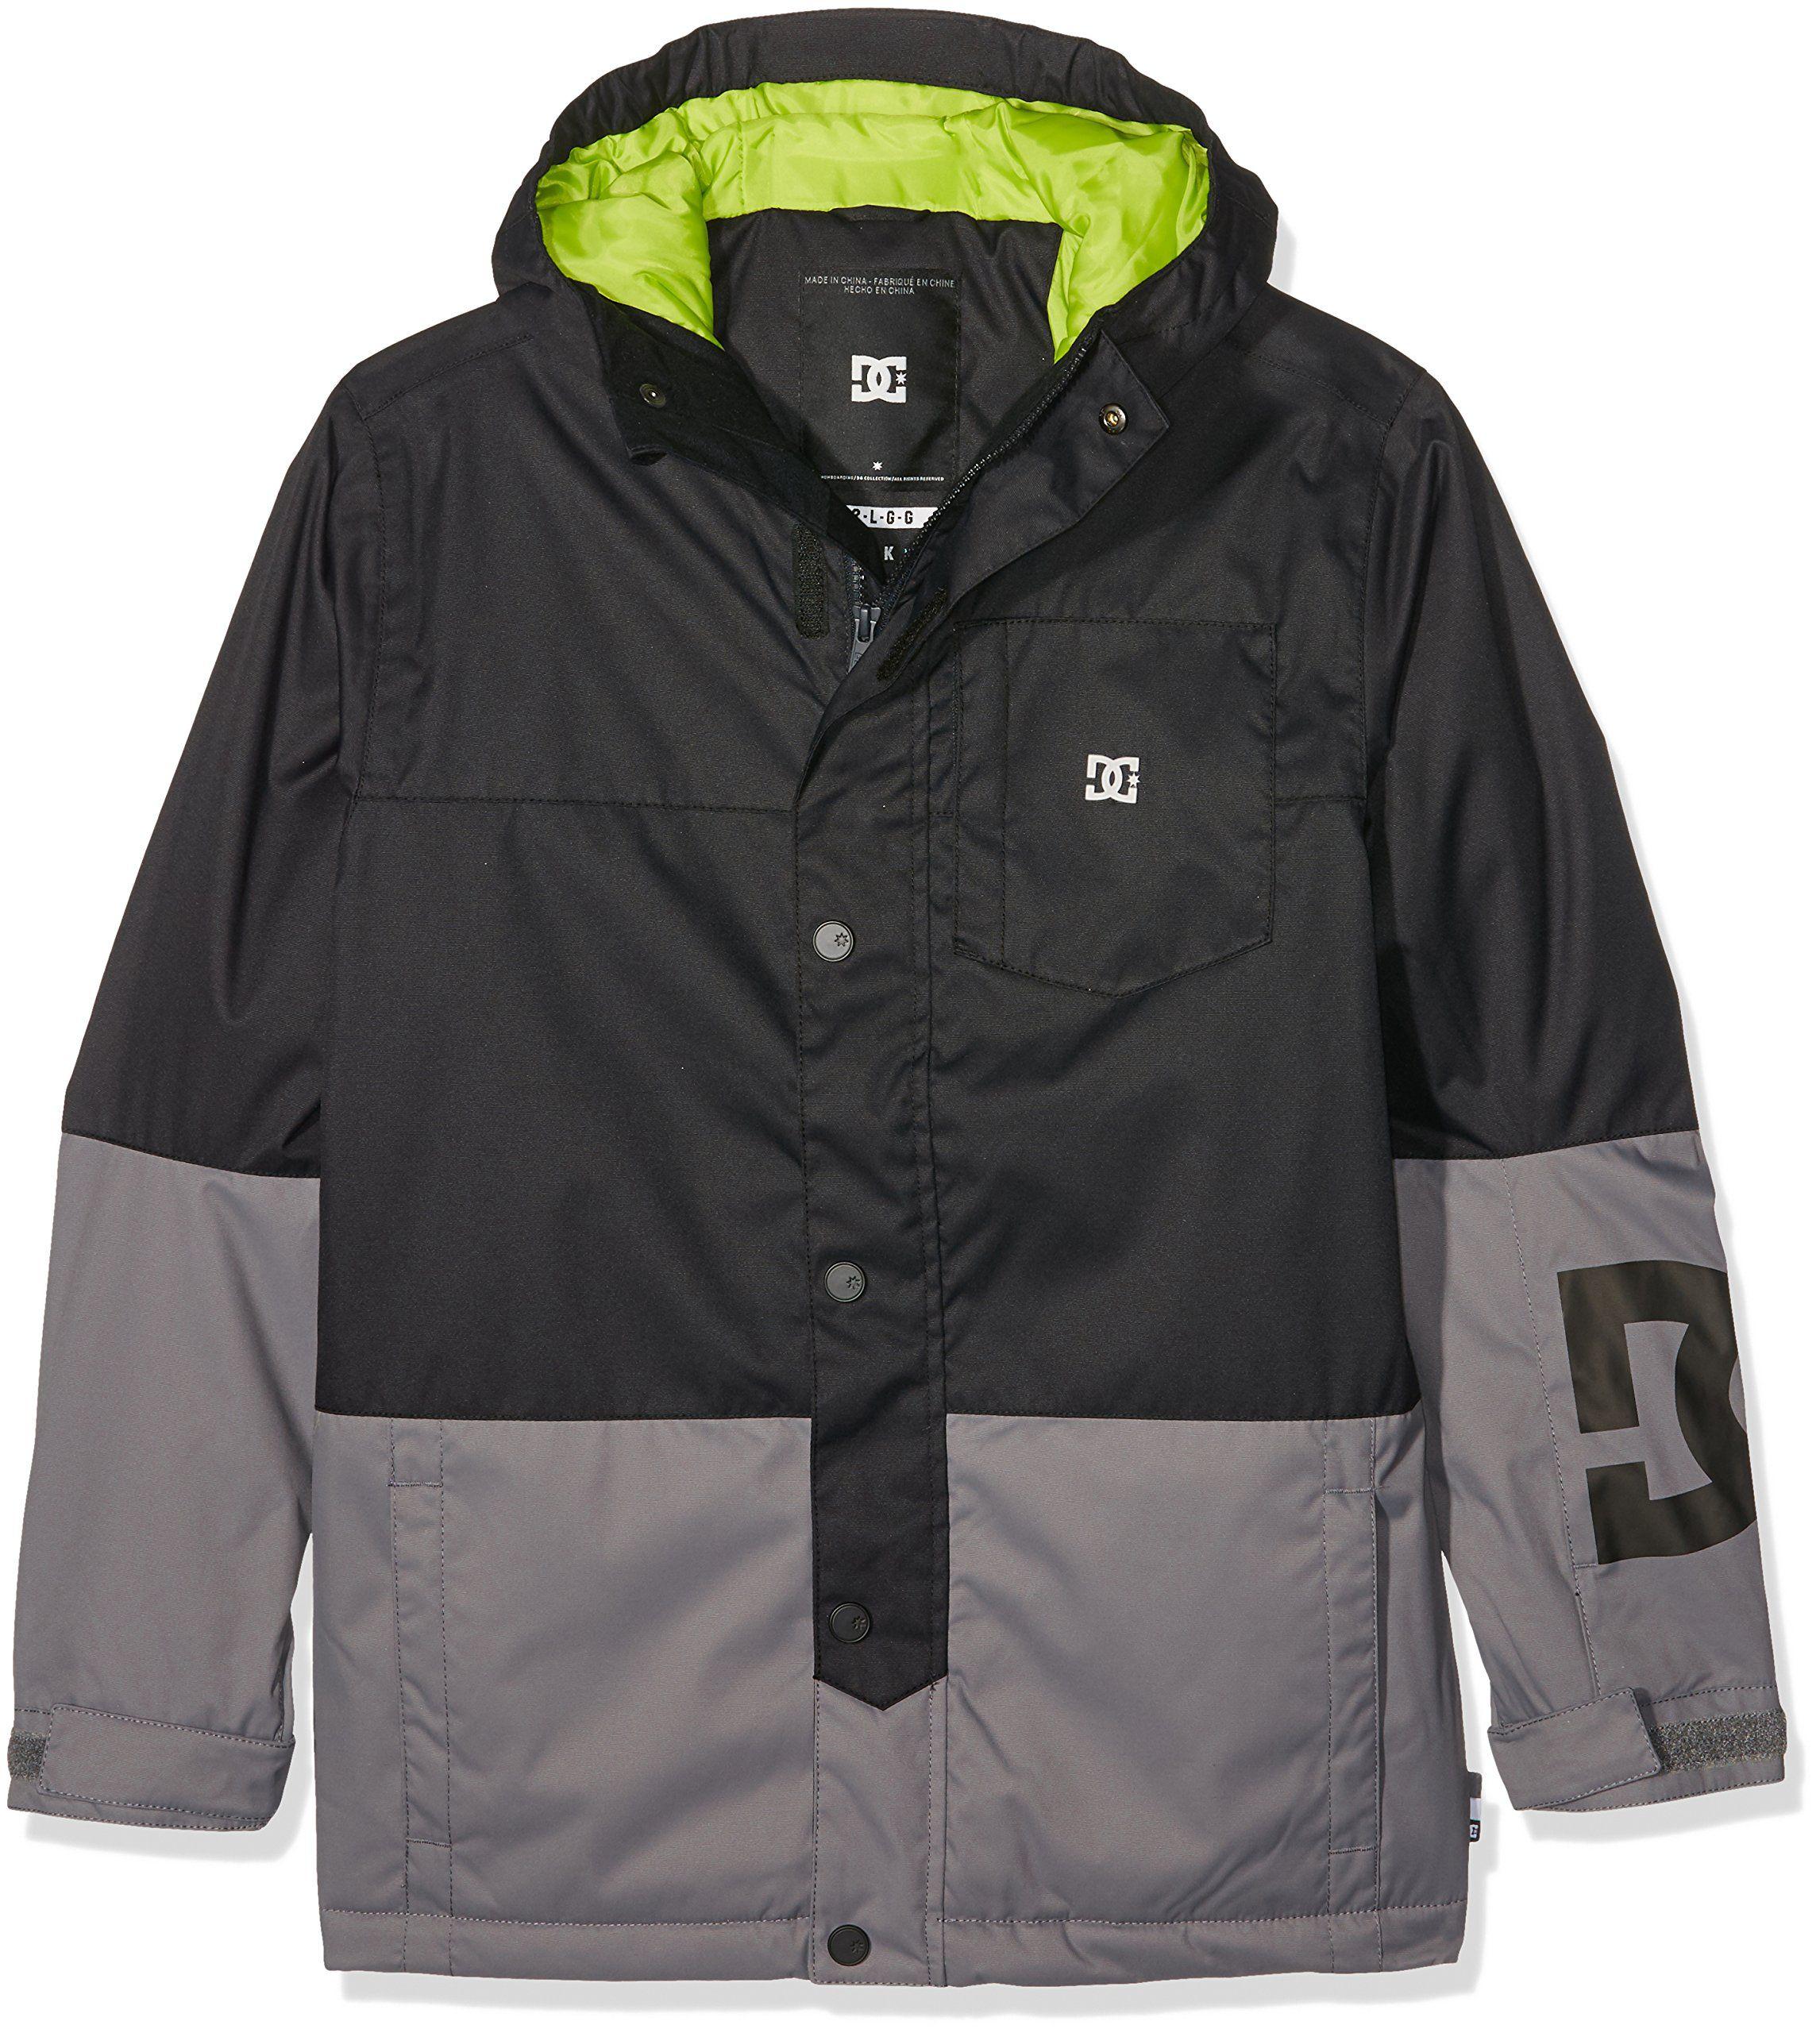 14490cc49cae DC Snow Jackets - DC Defy Youth Snow Jacket - Black. Boy Snow Jackets.